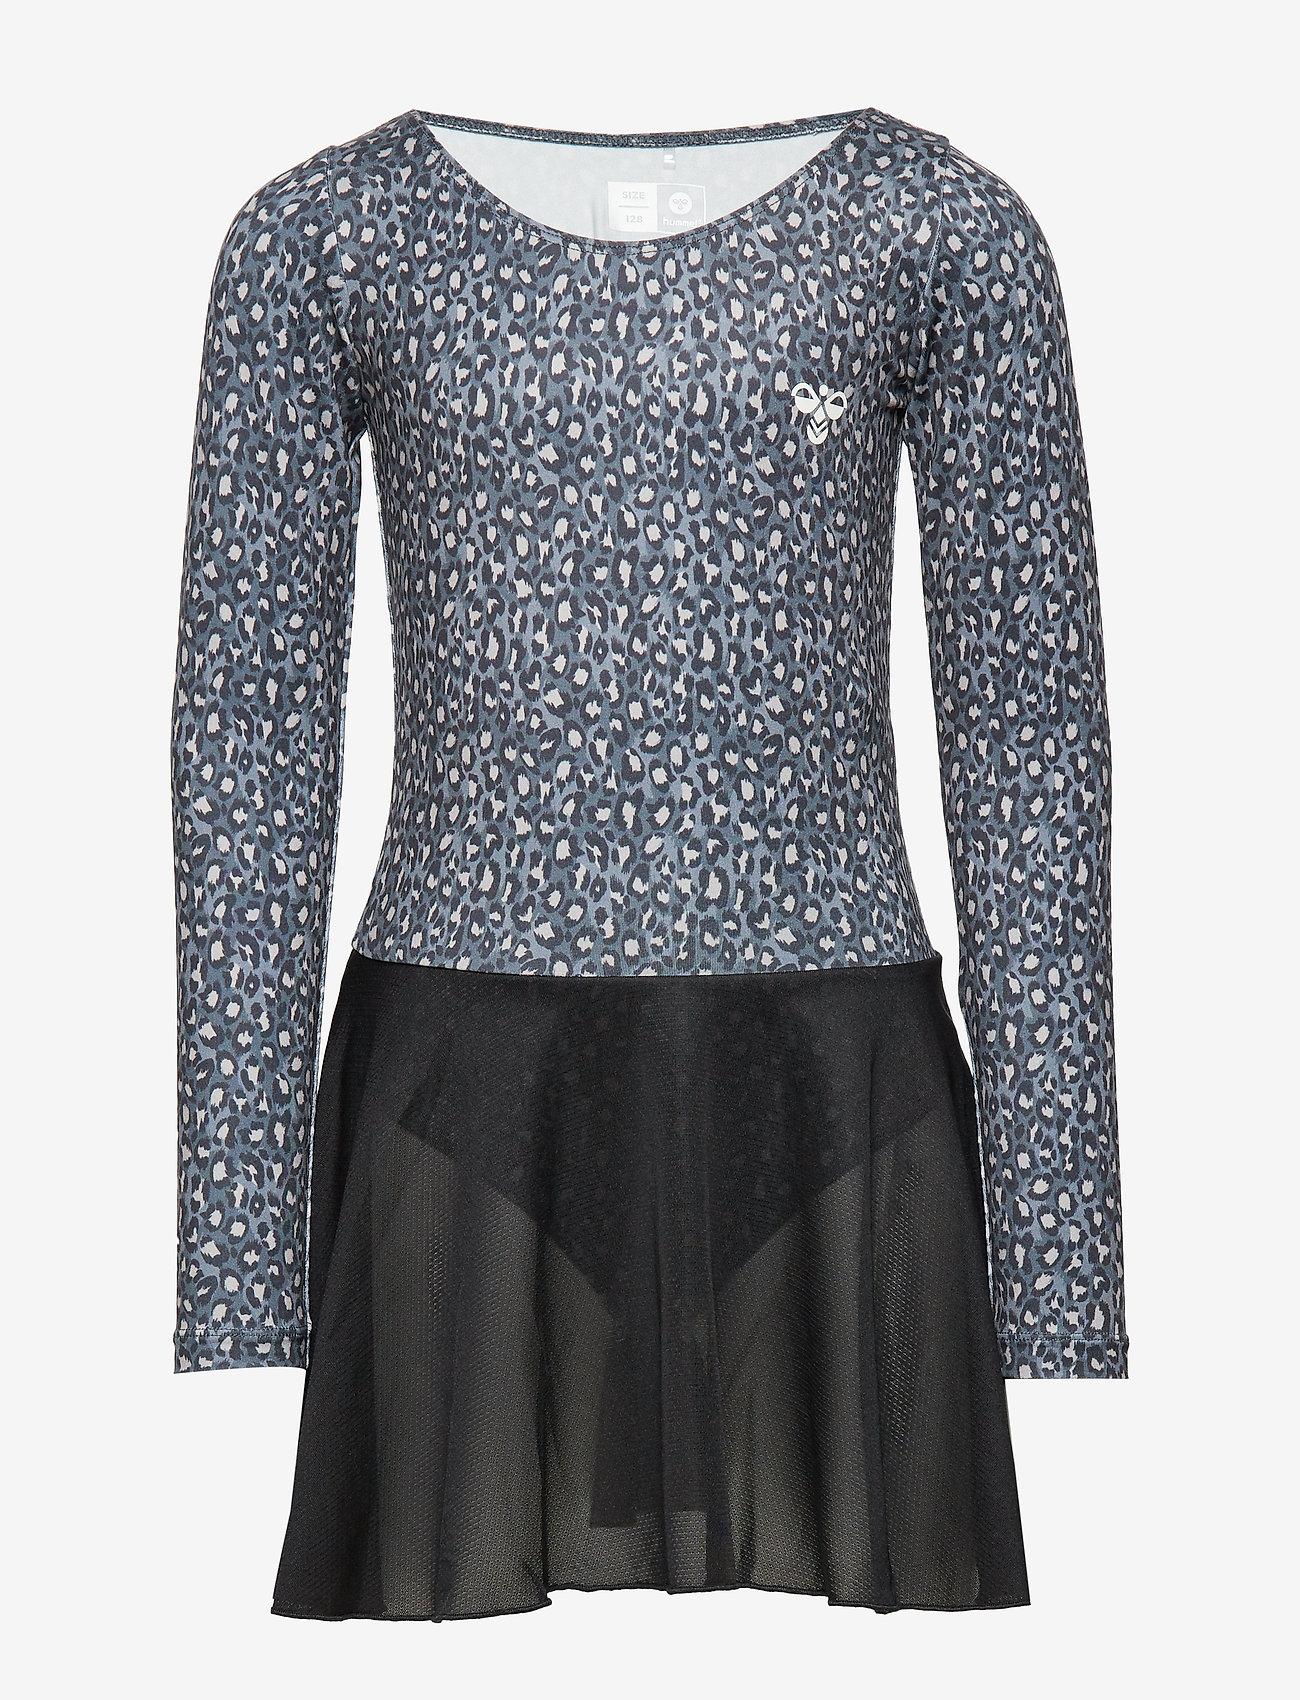 Hummel - hmlFREJA GYM SUIT - robes - black/grey